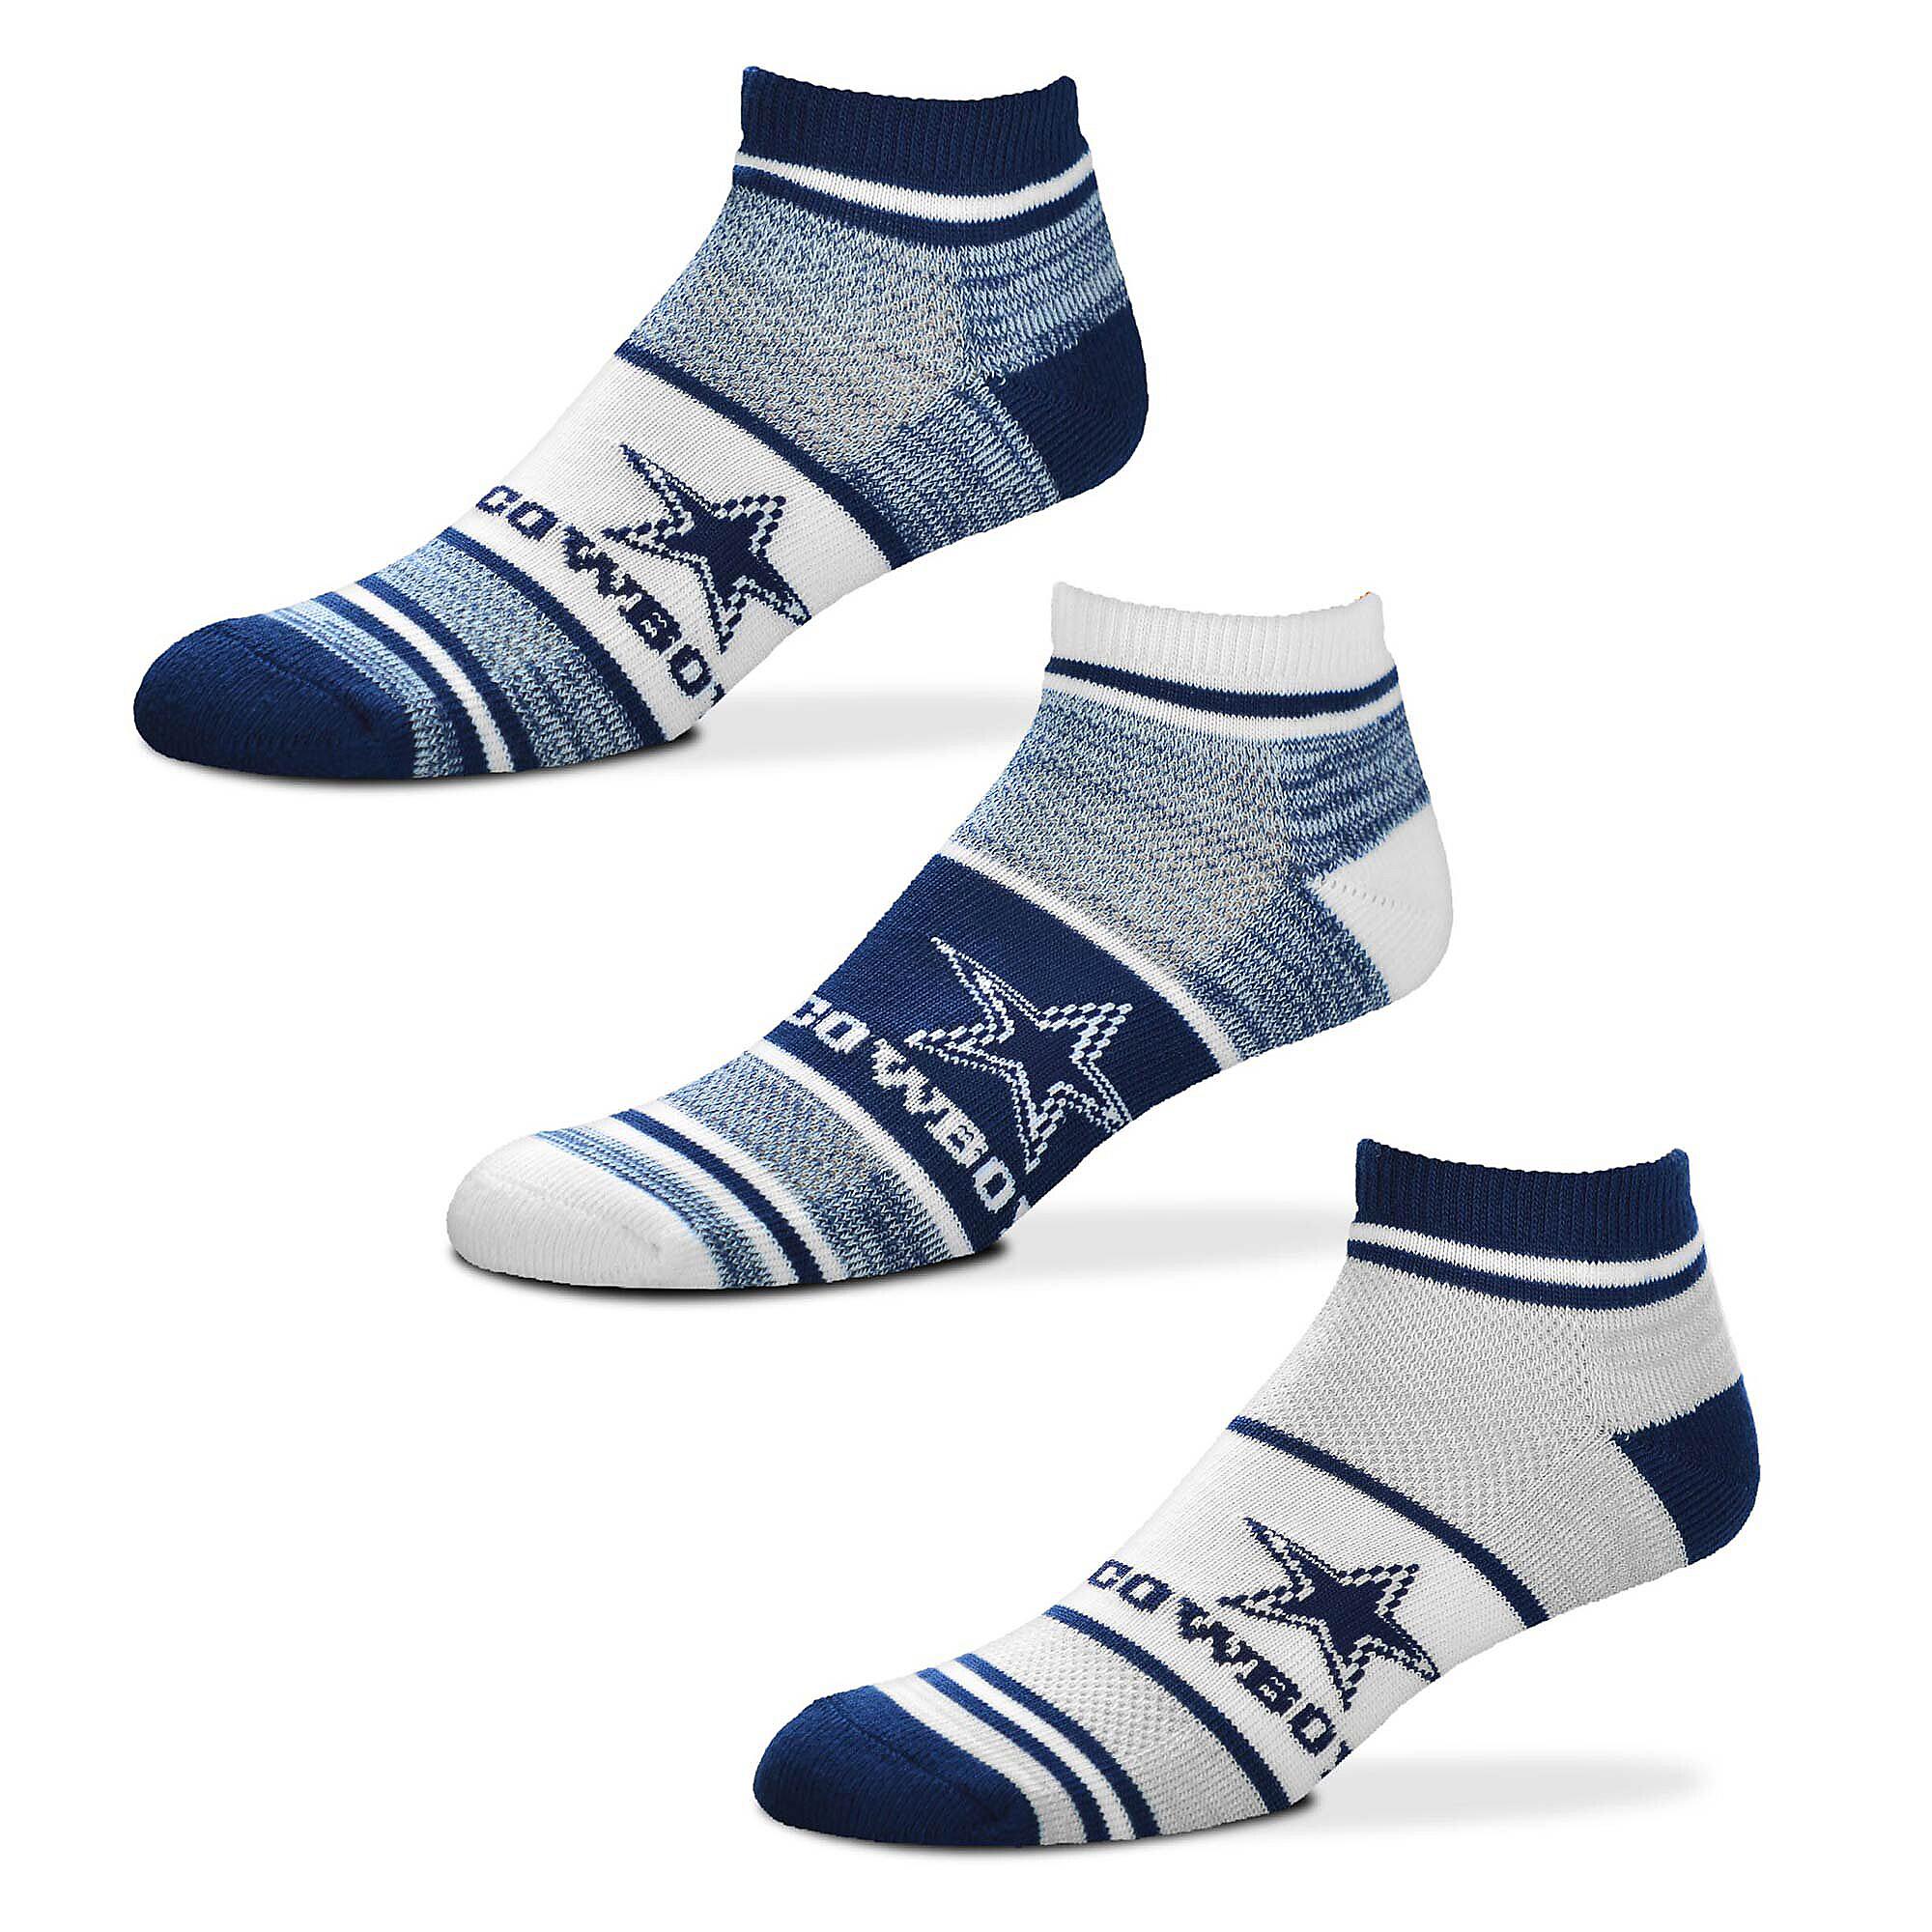 Dallas Cowboys Triplex Heathered Lightweight Socks - 3 Pack